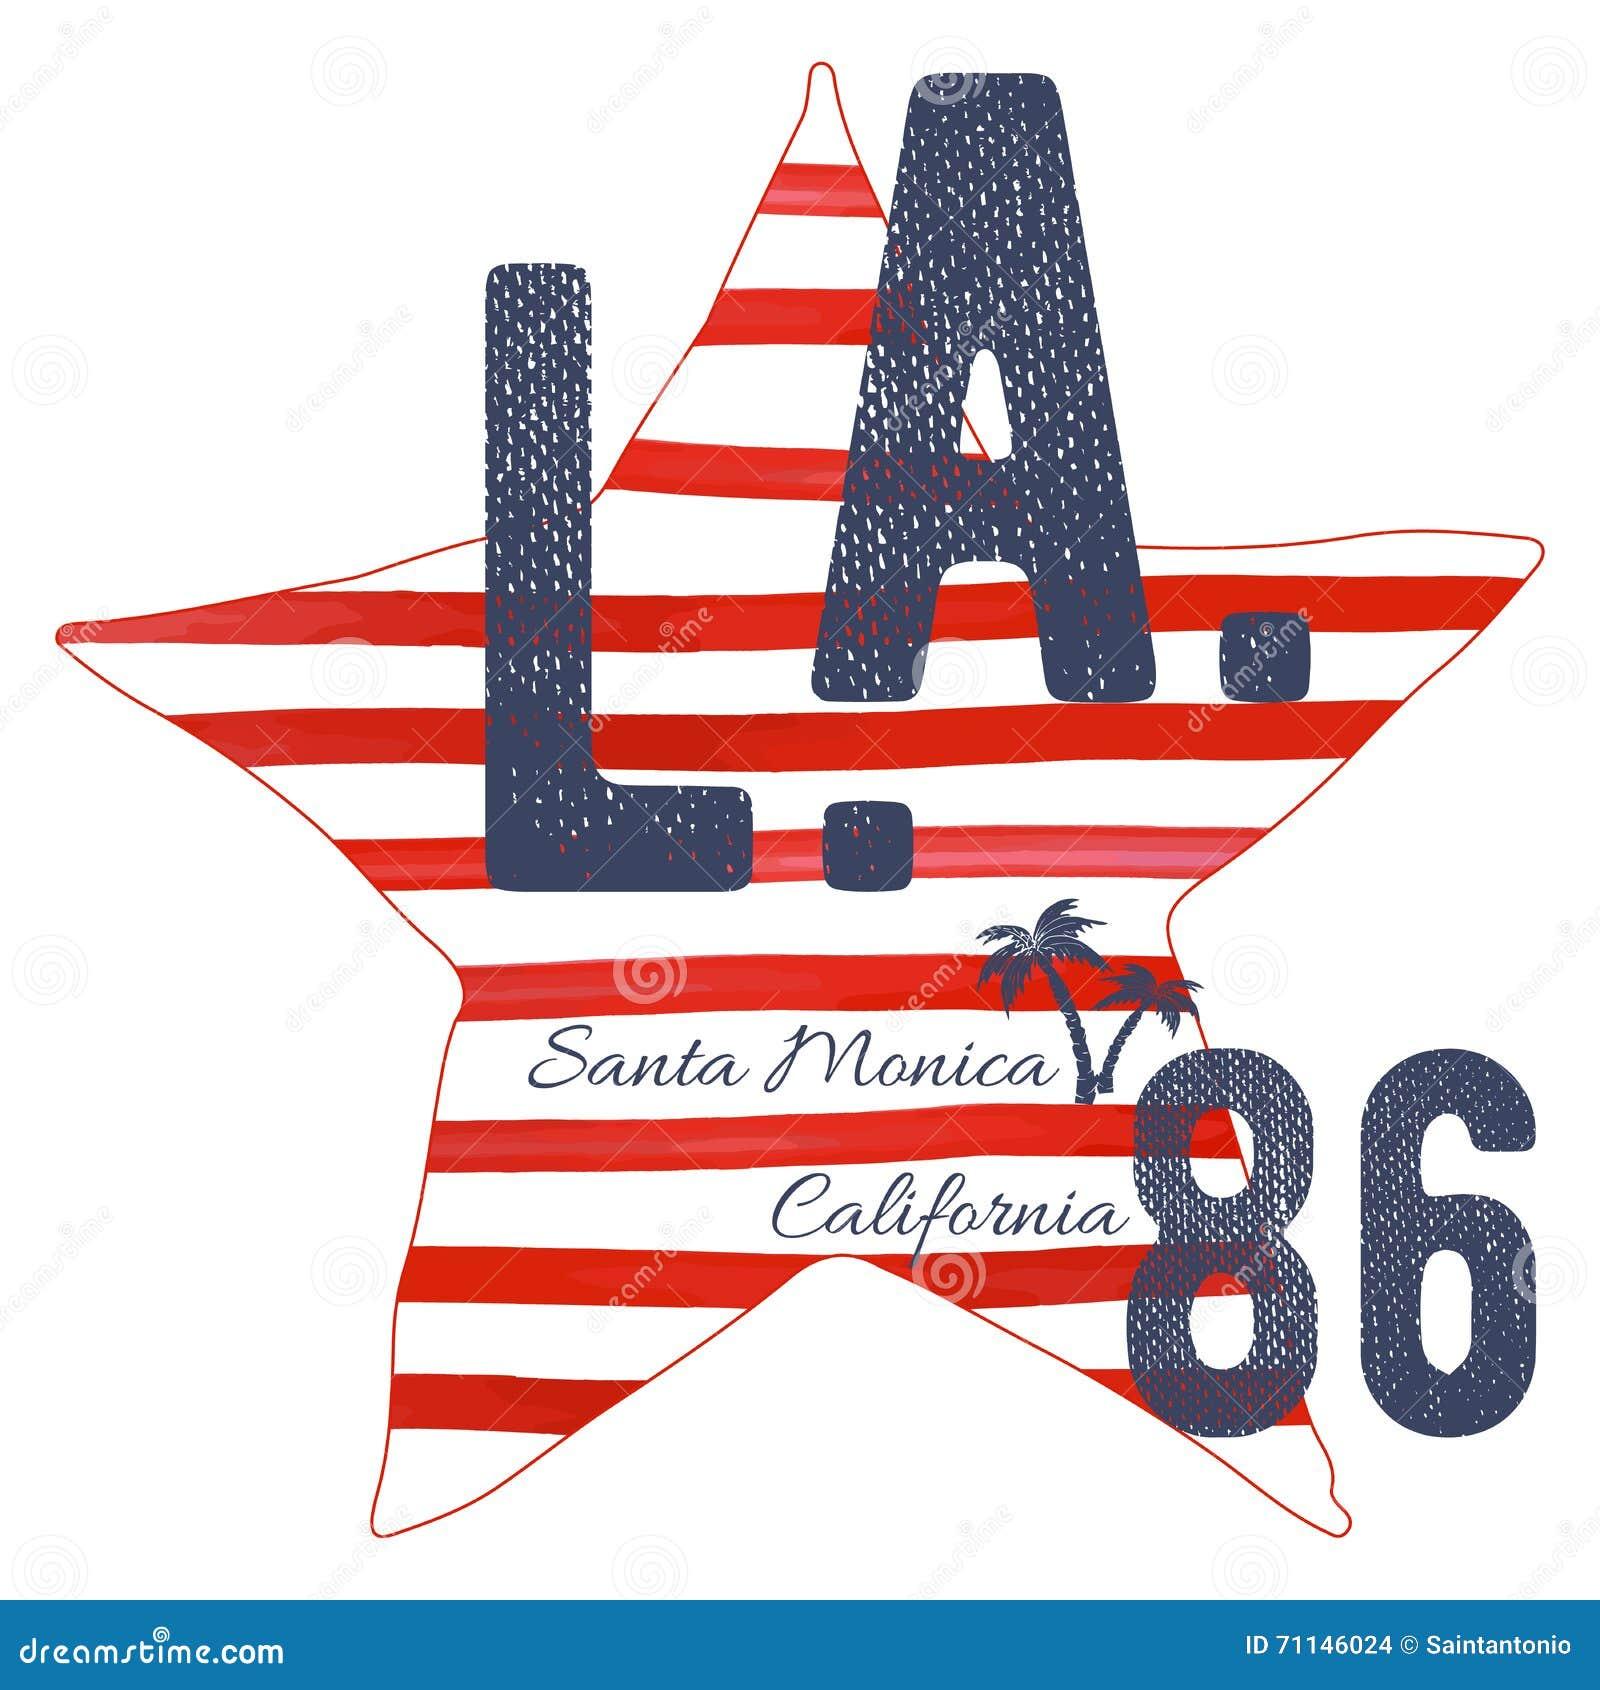 Graphic Design Santa Monica